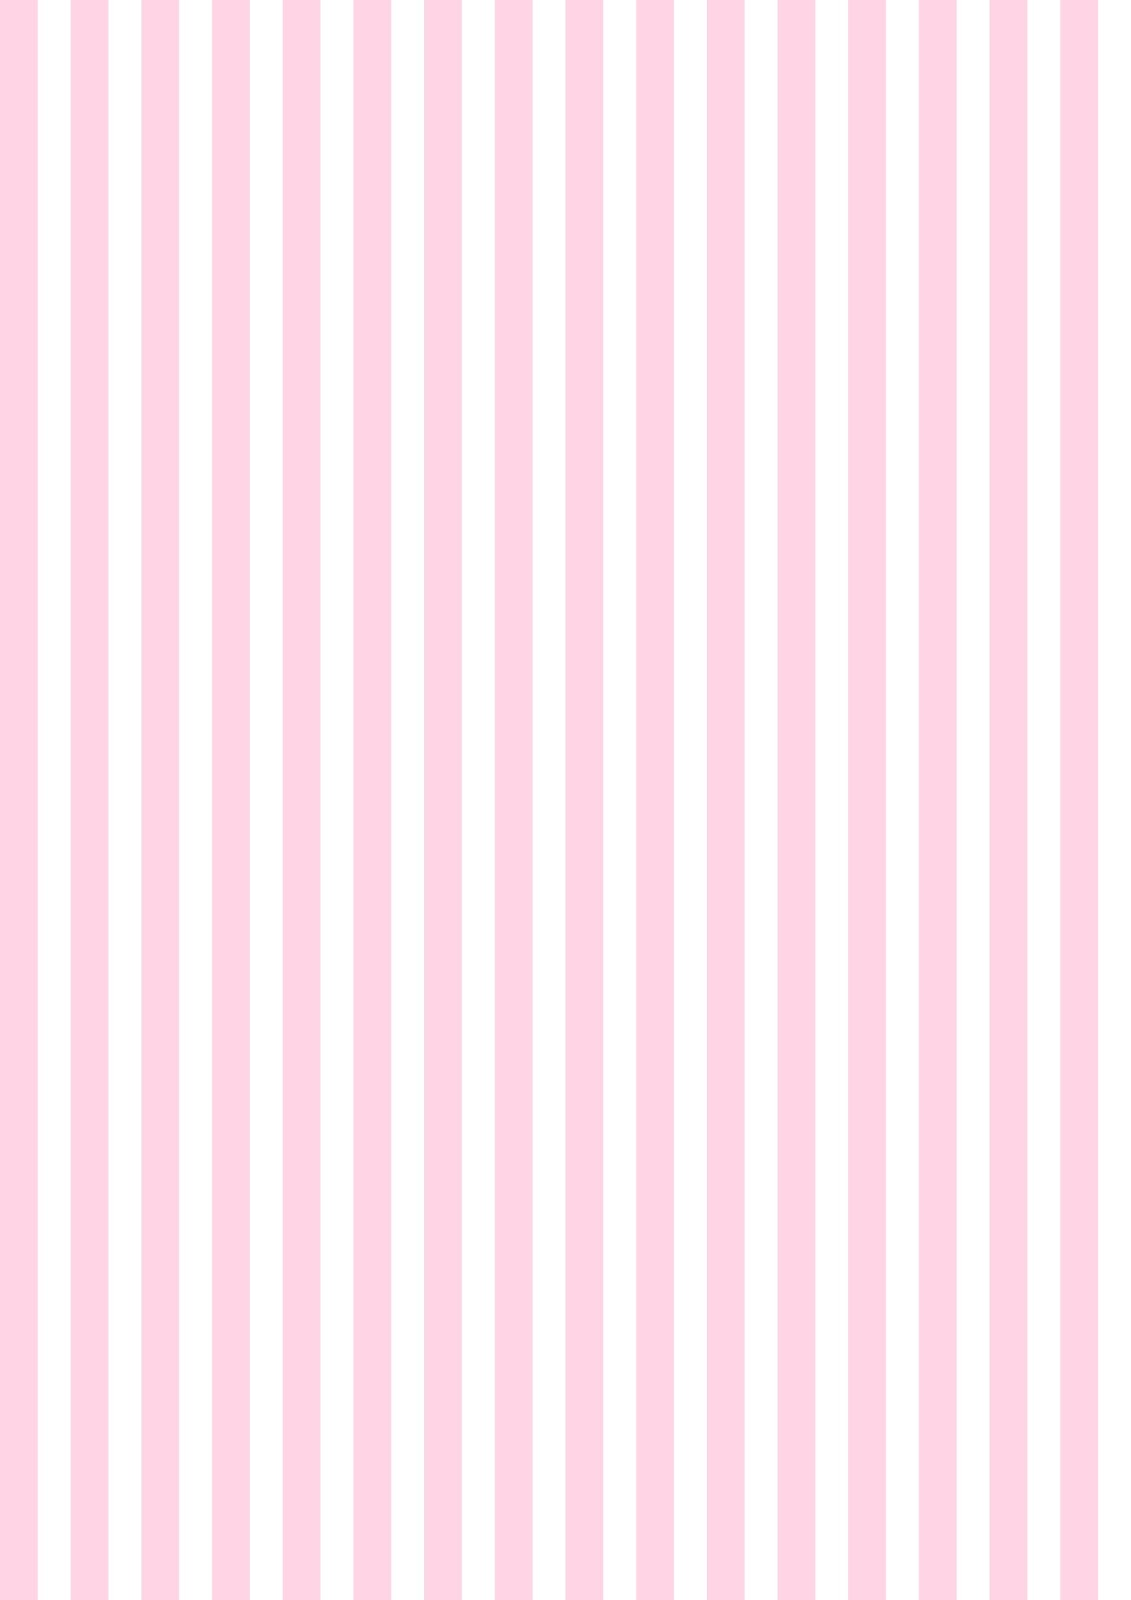 Pink pattern stripes - photo#7